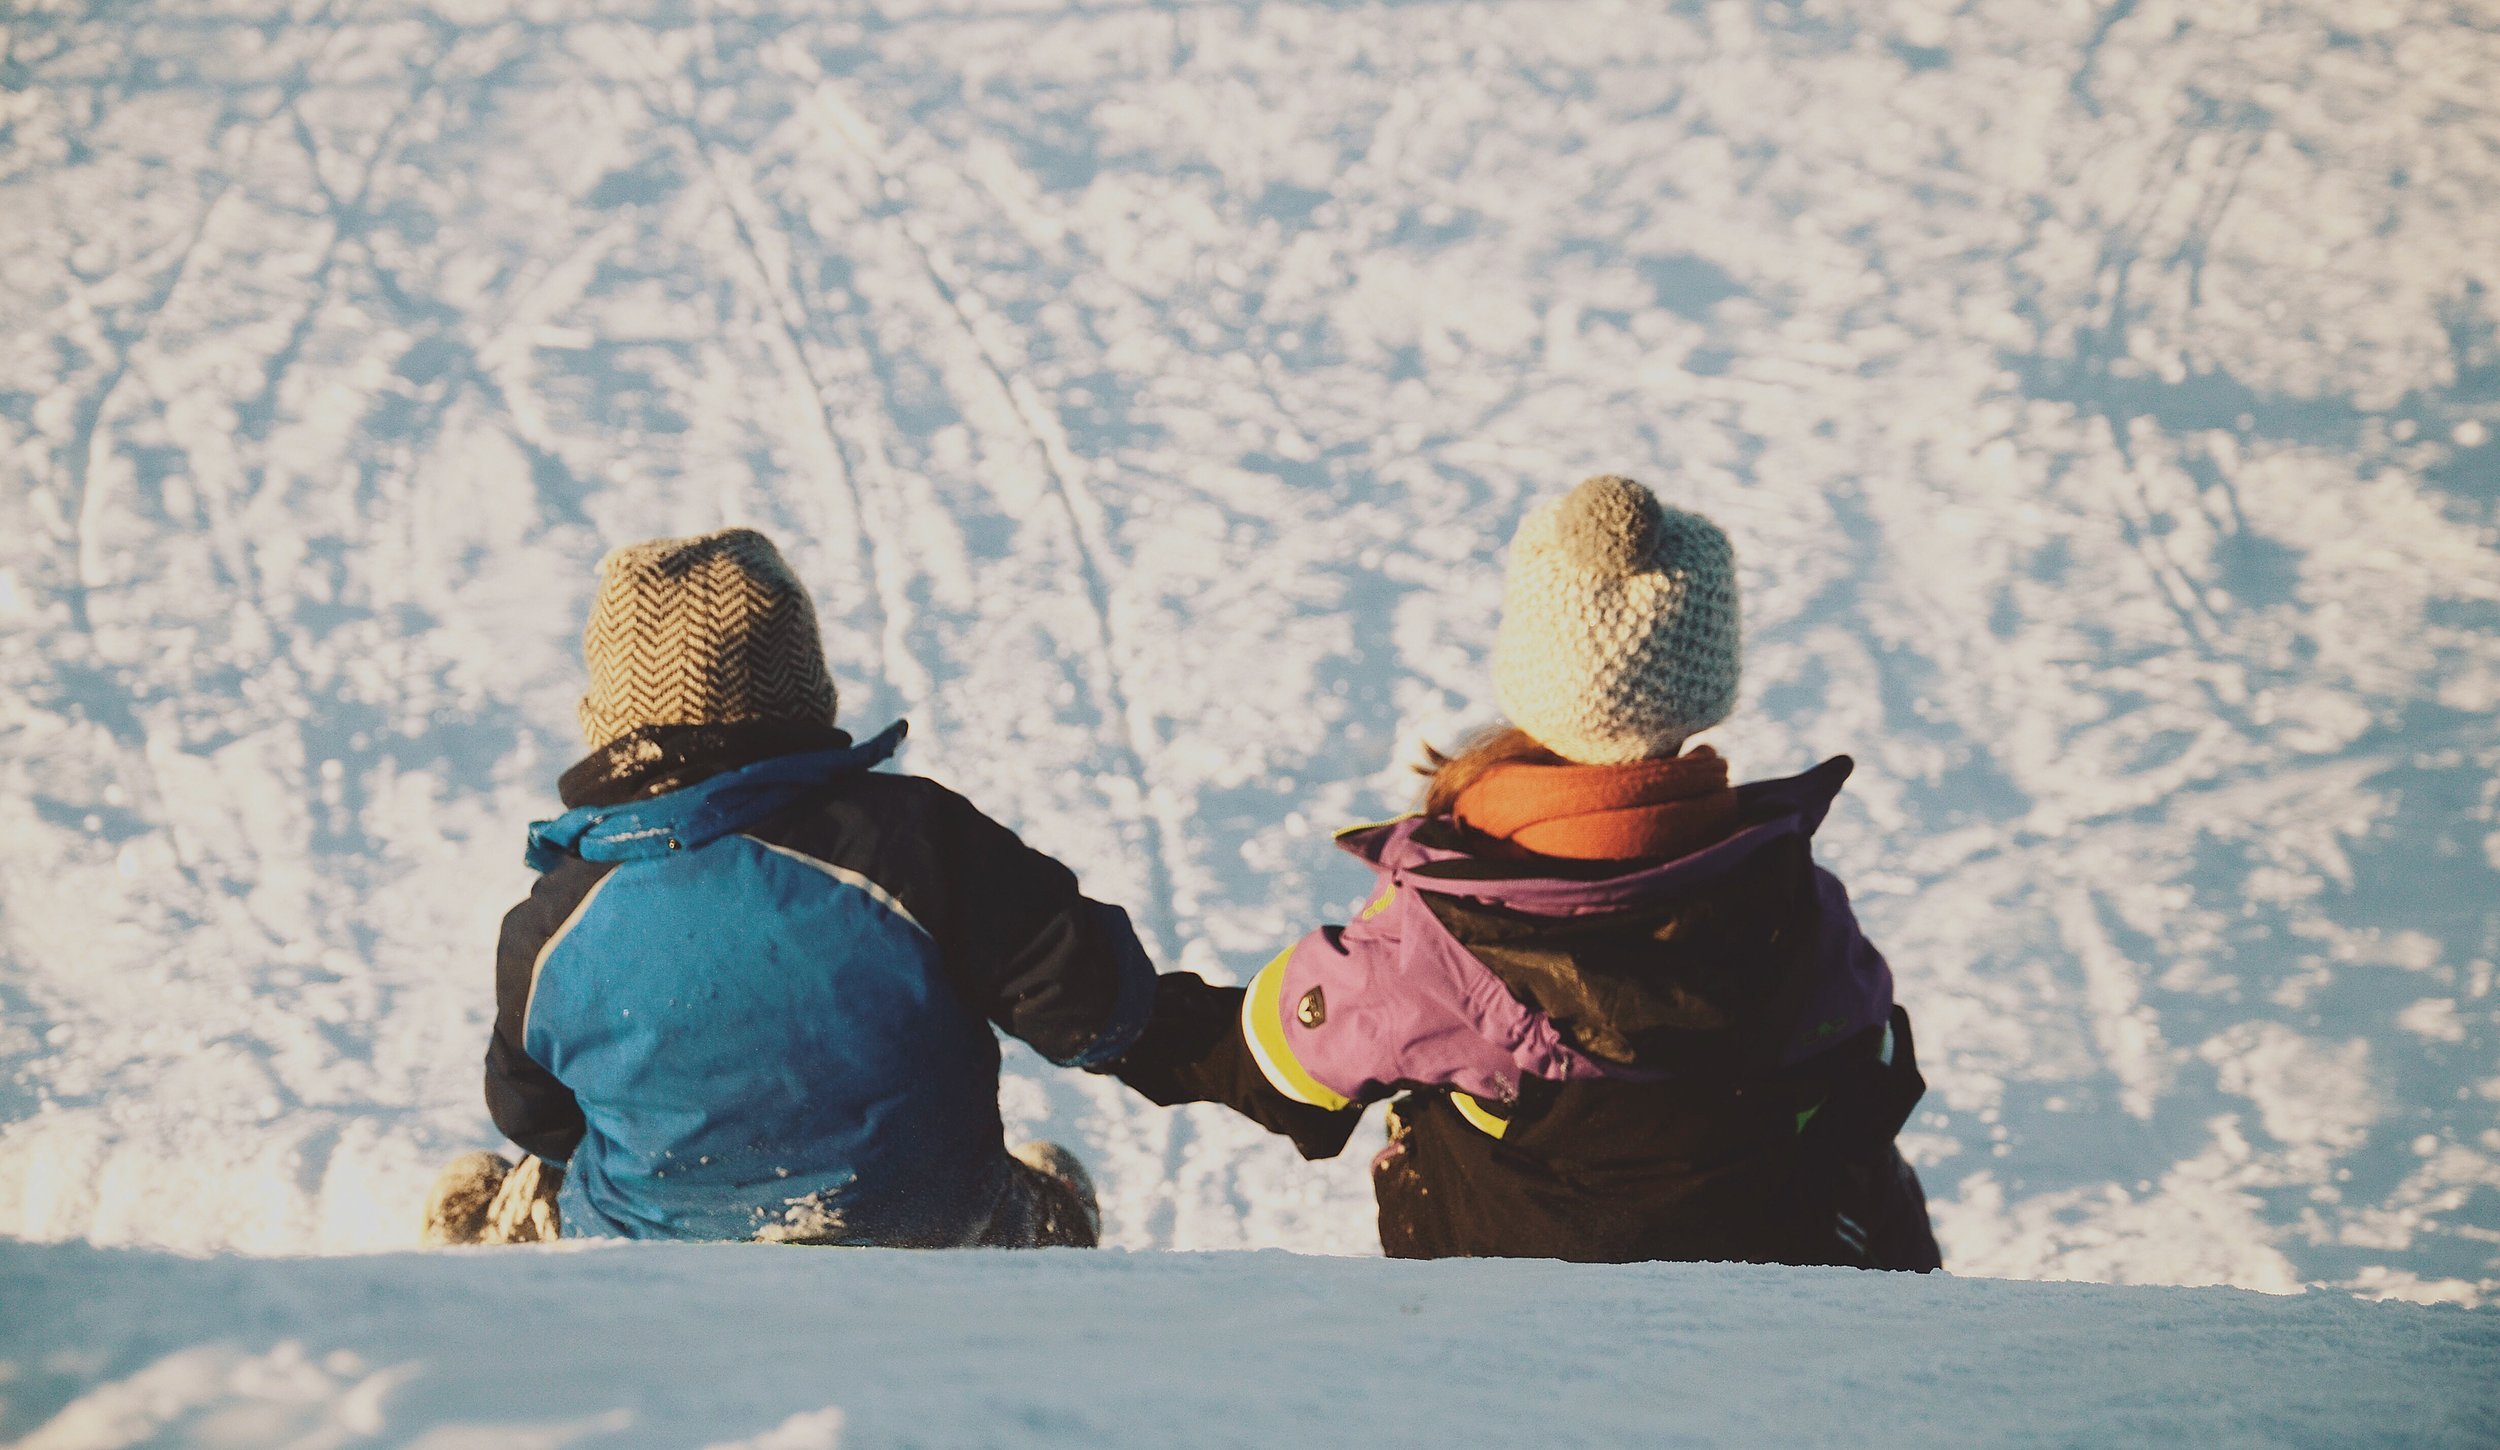 michal-janek-kids in snow-unsplash.jpg